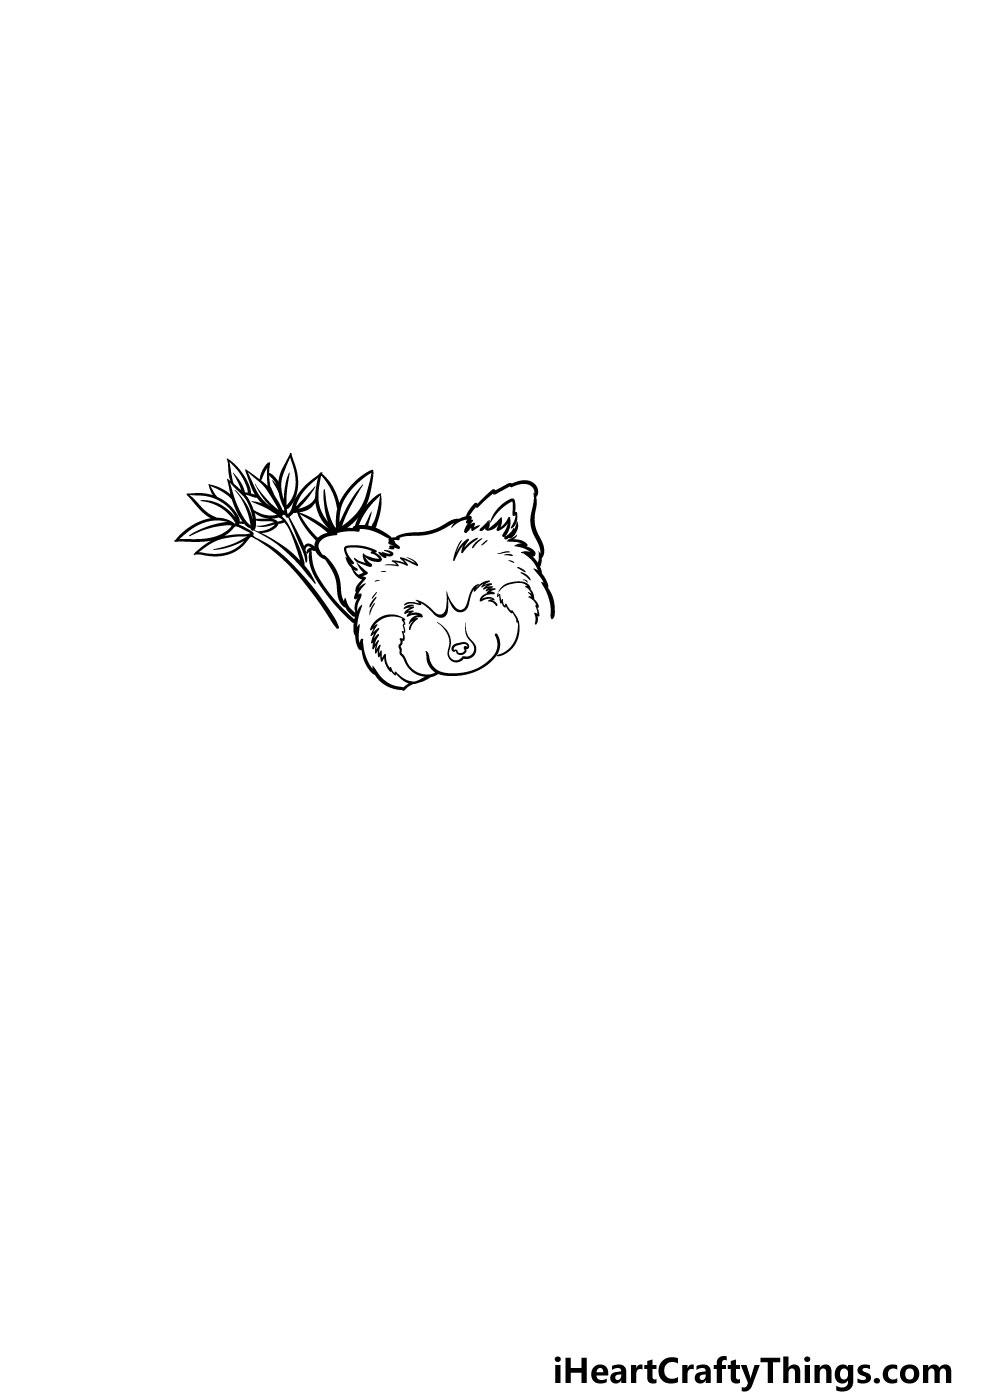 drawing a Red Panda step 2